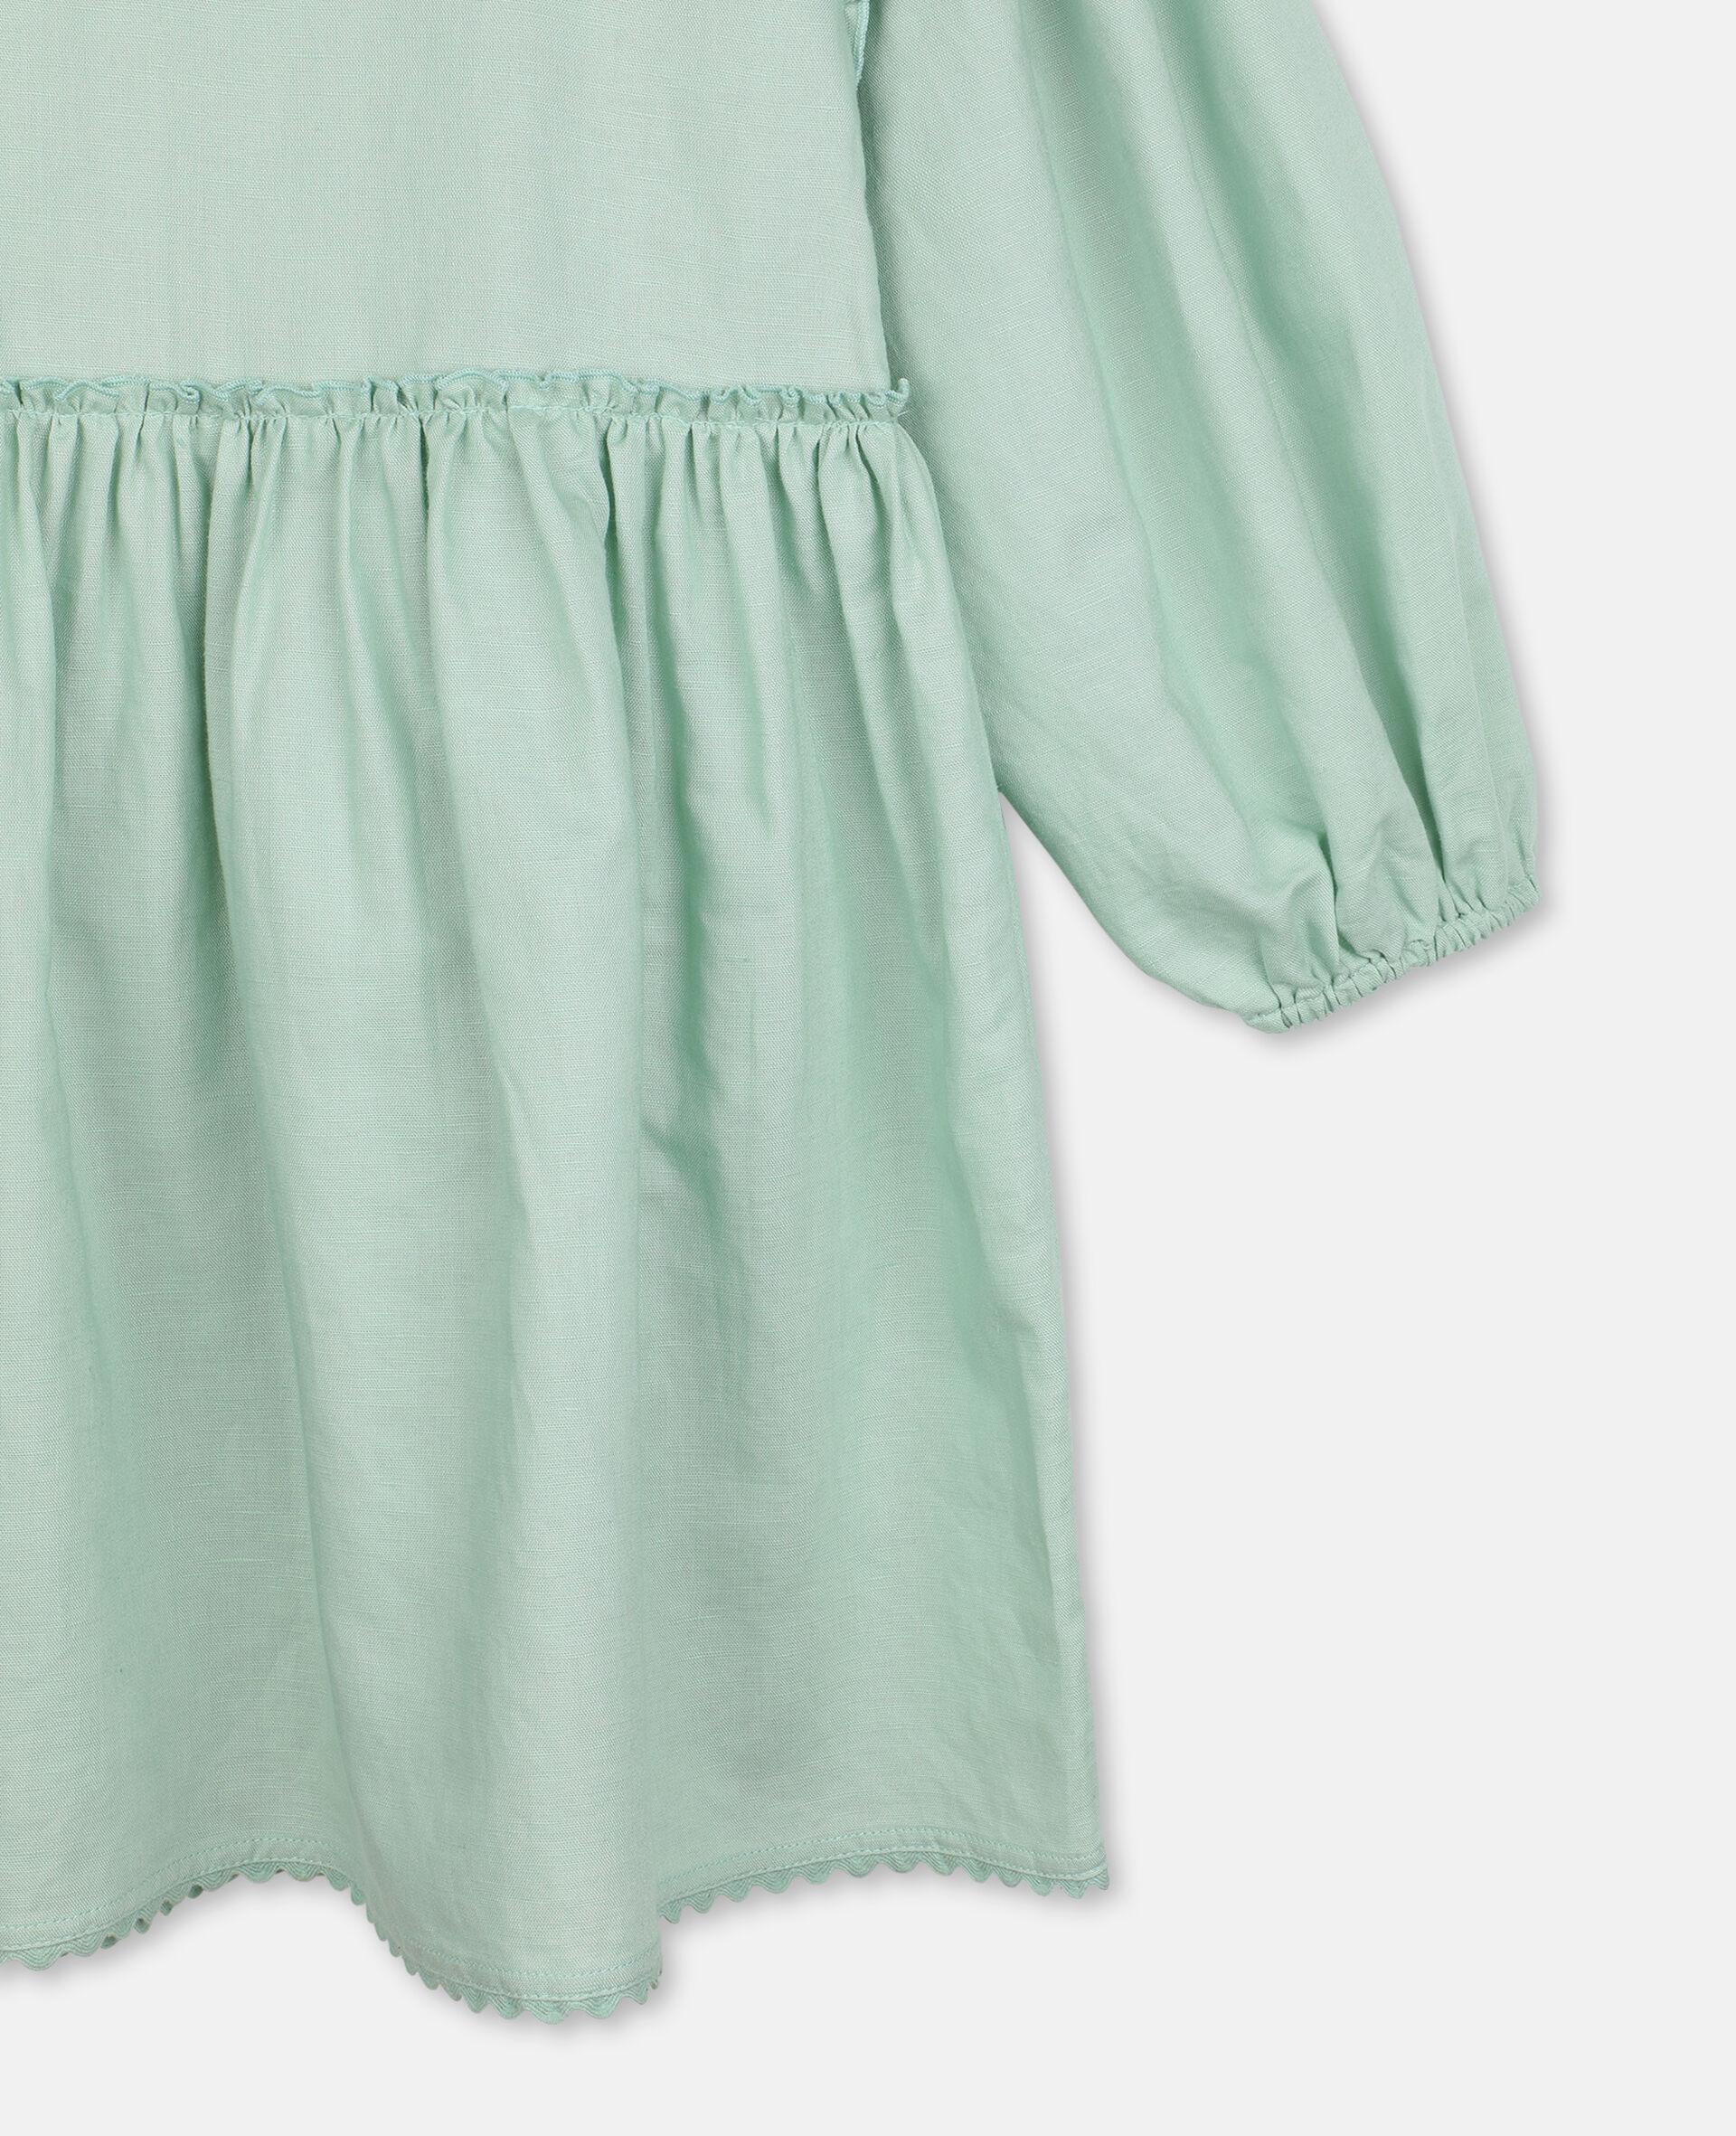 Kleid mit Schmetterling-Borte-Grün-large image number 2